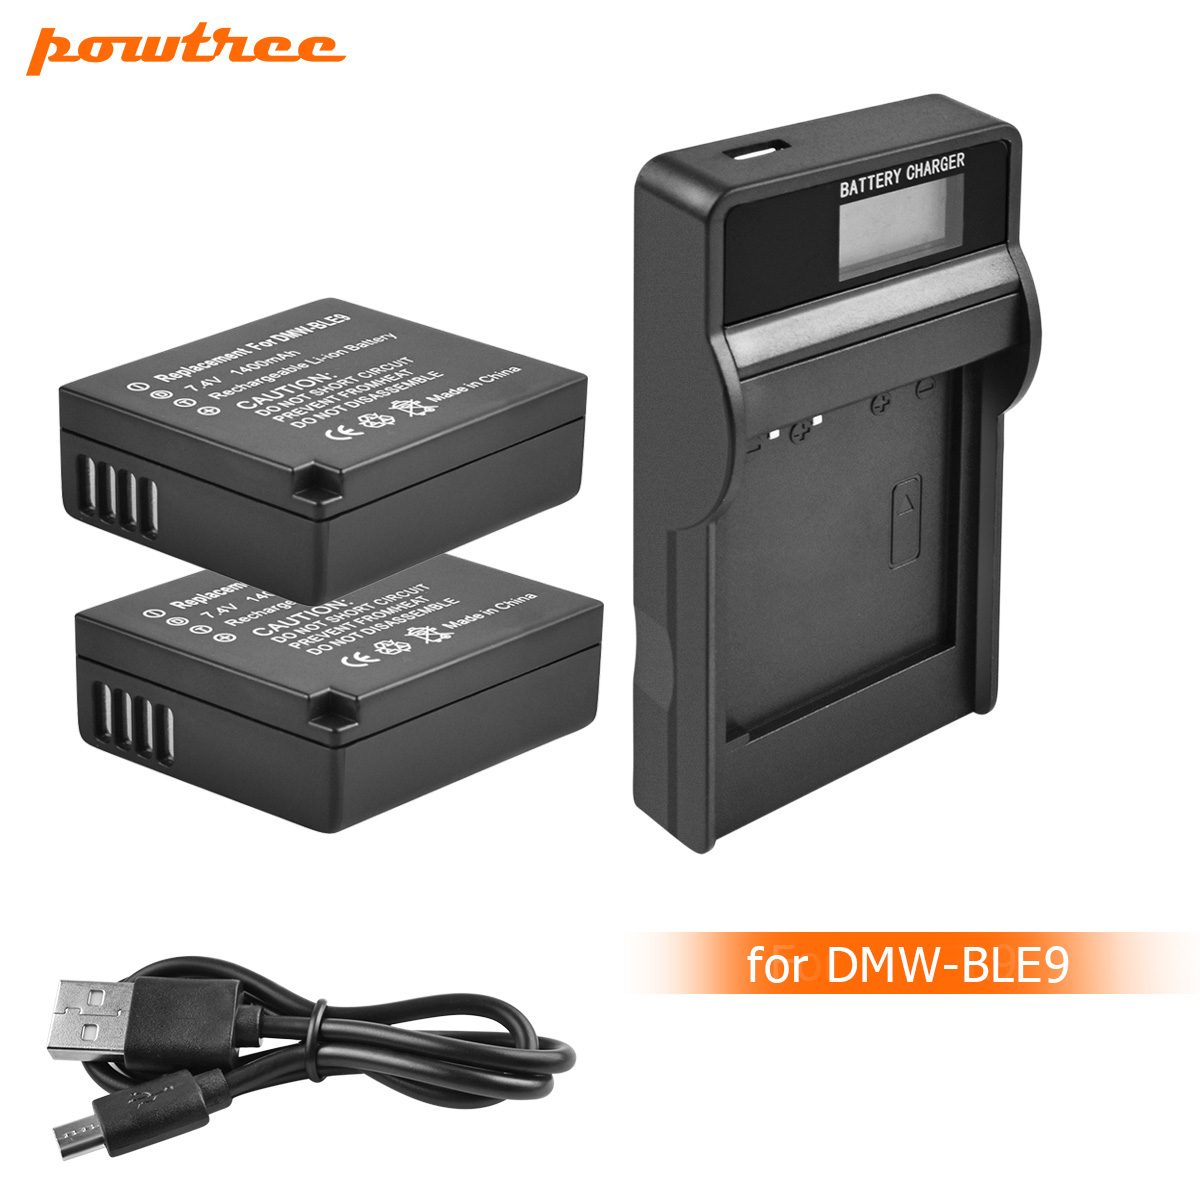 Powtree DMW-BLG10 DMW BLG10 DMW-BLE9 Battery+LCD Charger For Panasonic DMC GF6 GX7 GF3 GF5 DMW-BLG10GK LX100 GX80 GX85 L10